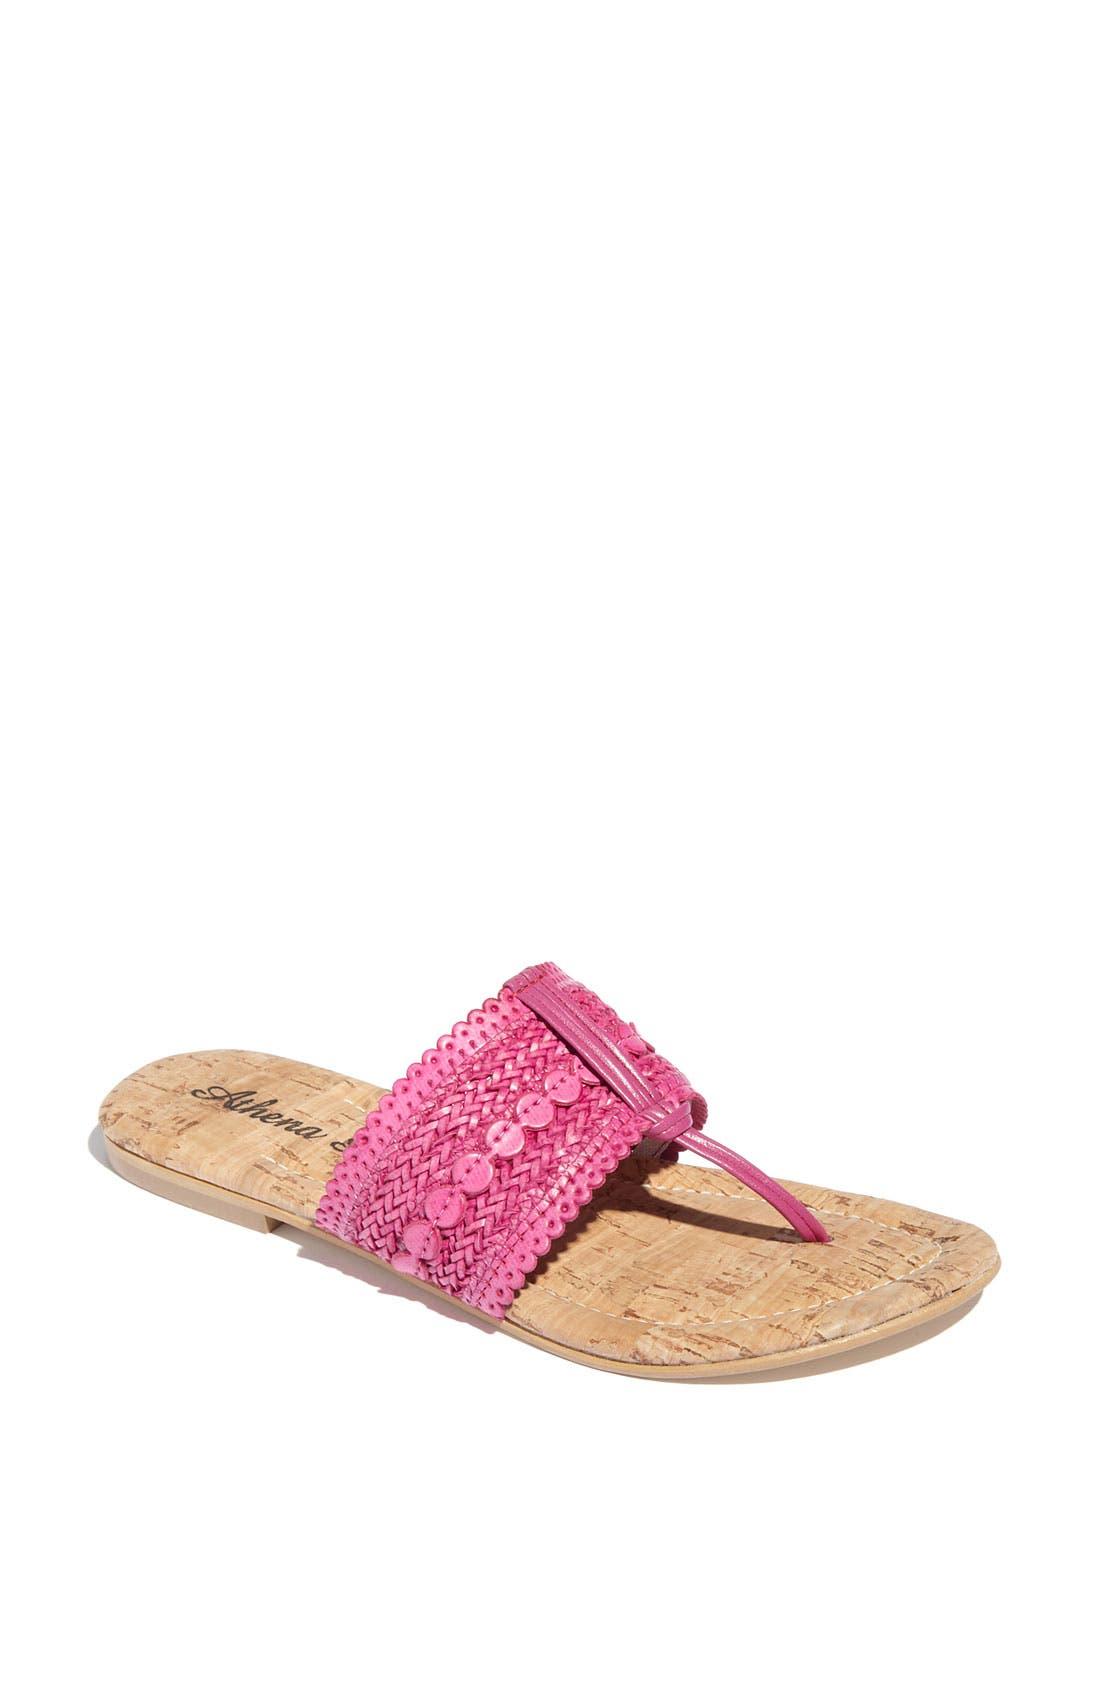 Main Image - Athena Alexander 'Malta' Sandal